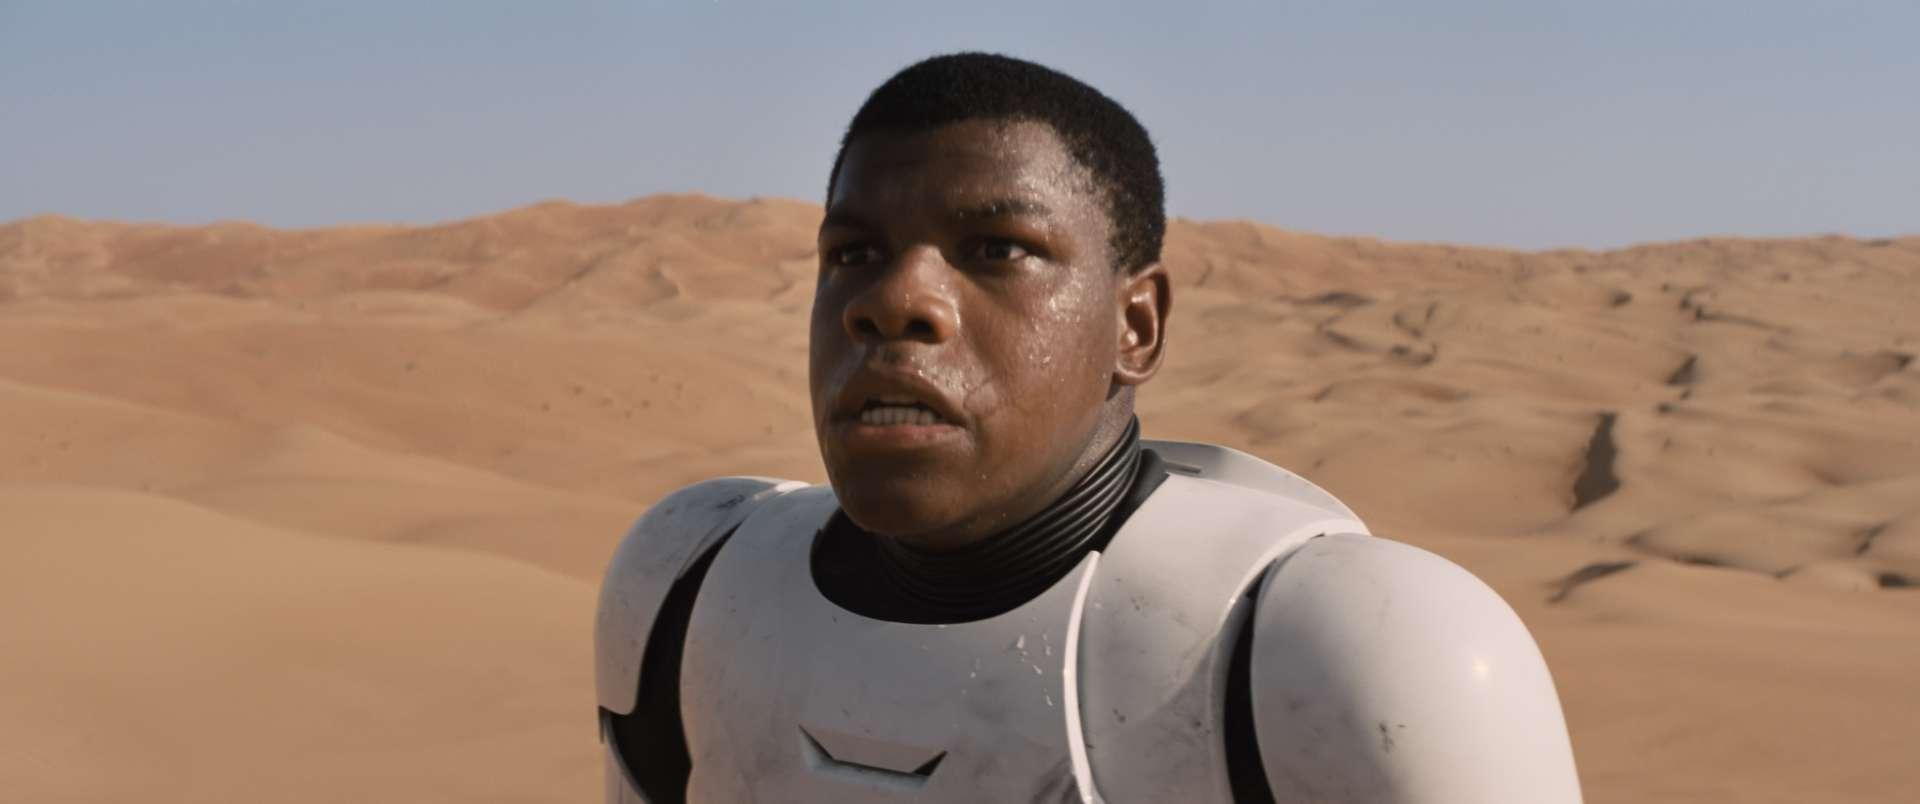 Star Wars Episode VII The Force Awakens Wallpaper 100